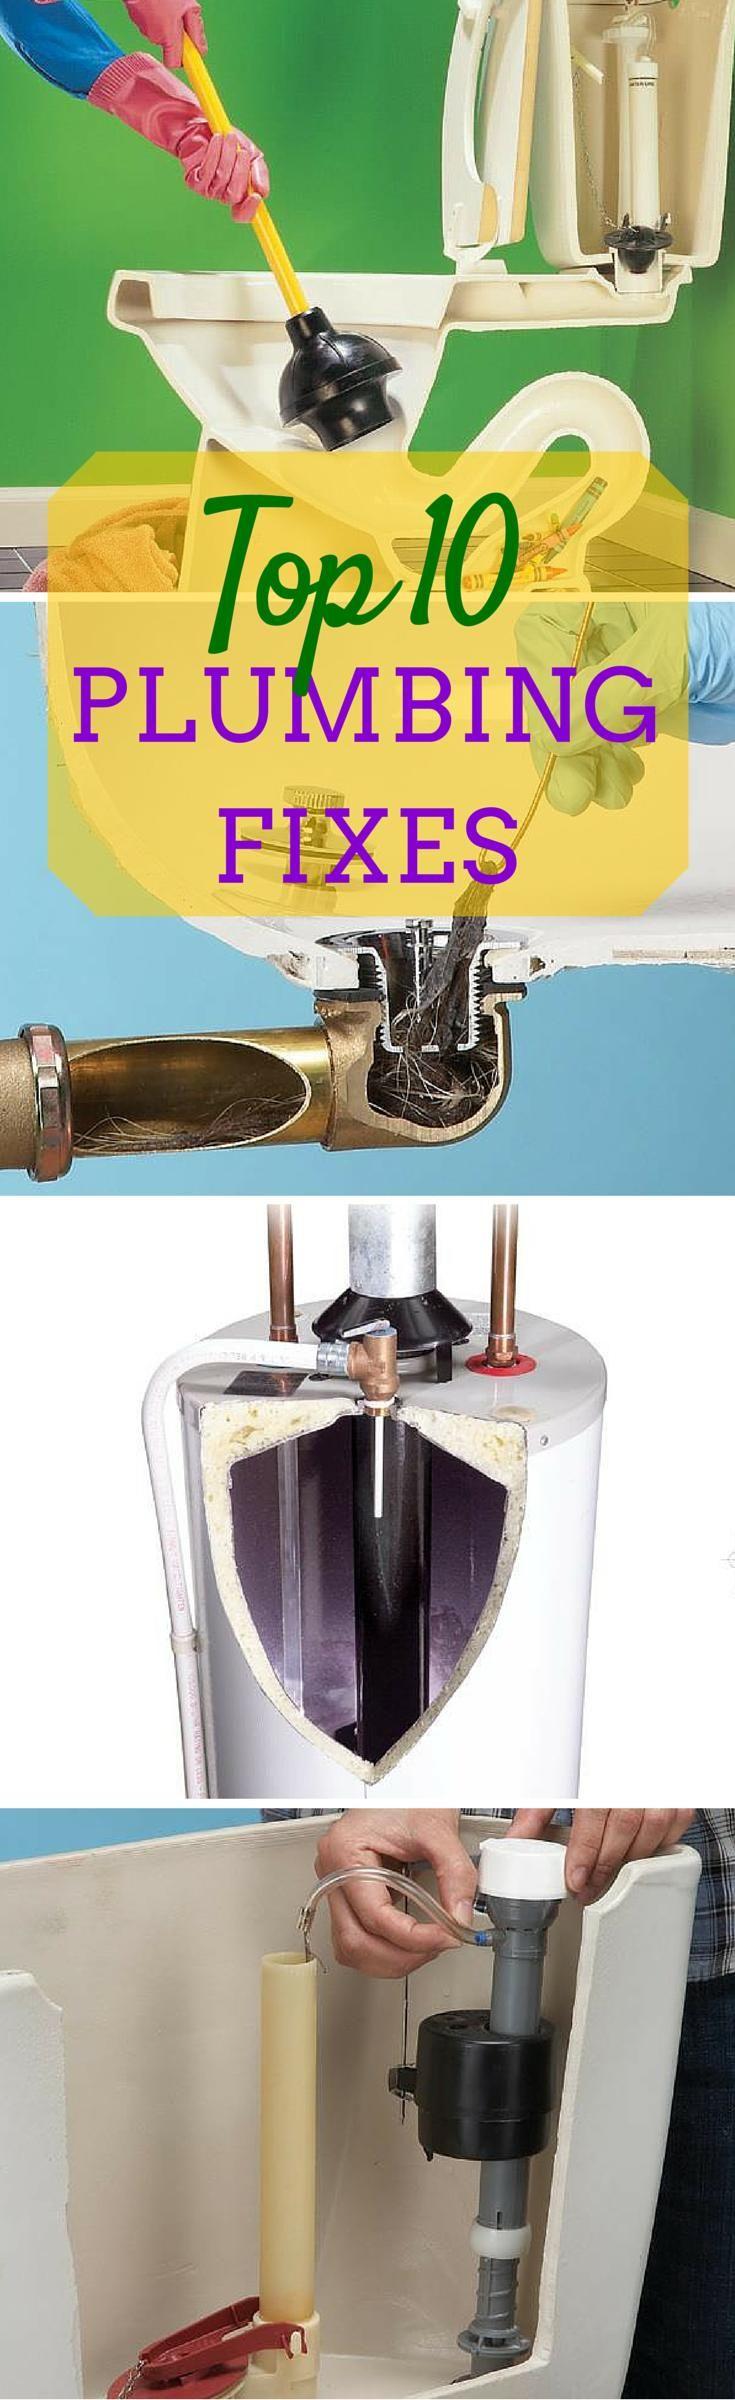 Top 10 Plumbing Fixes You Can Do Yourself Home repair